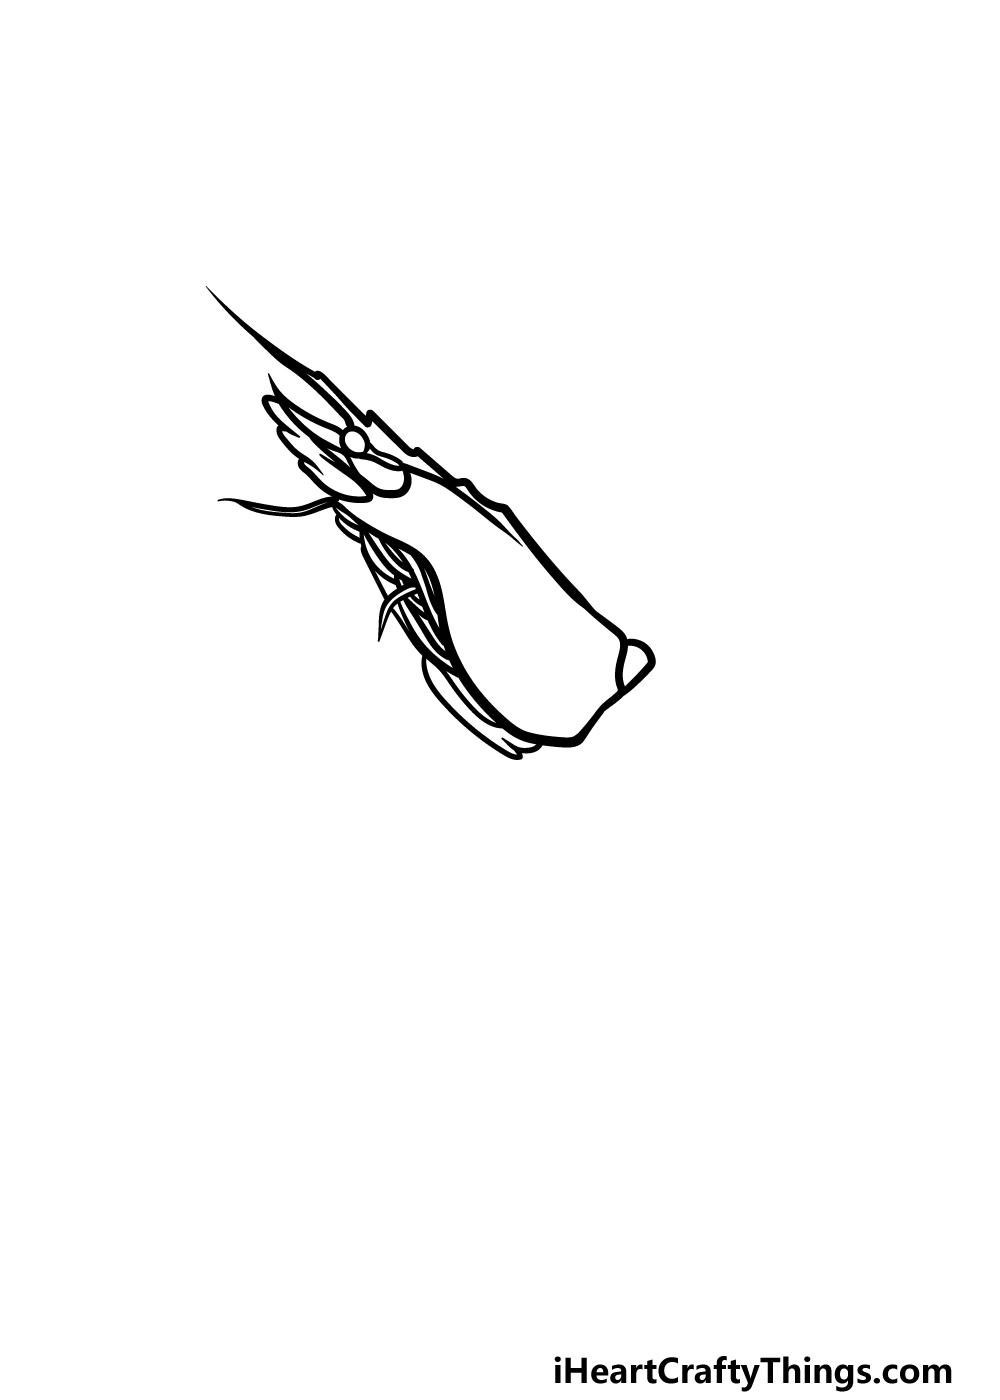 drawing a shrimp step 2